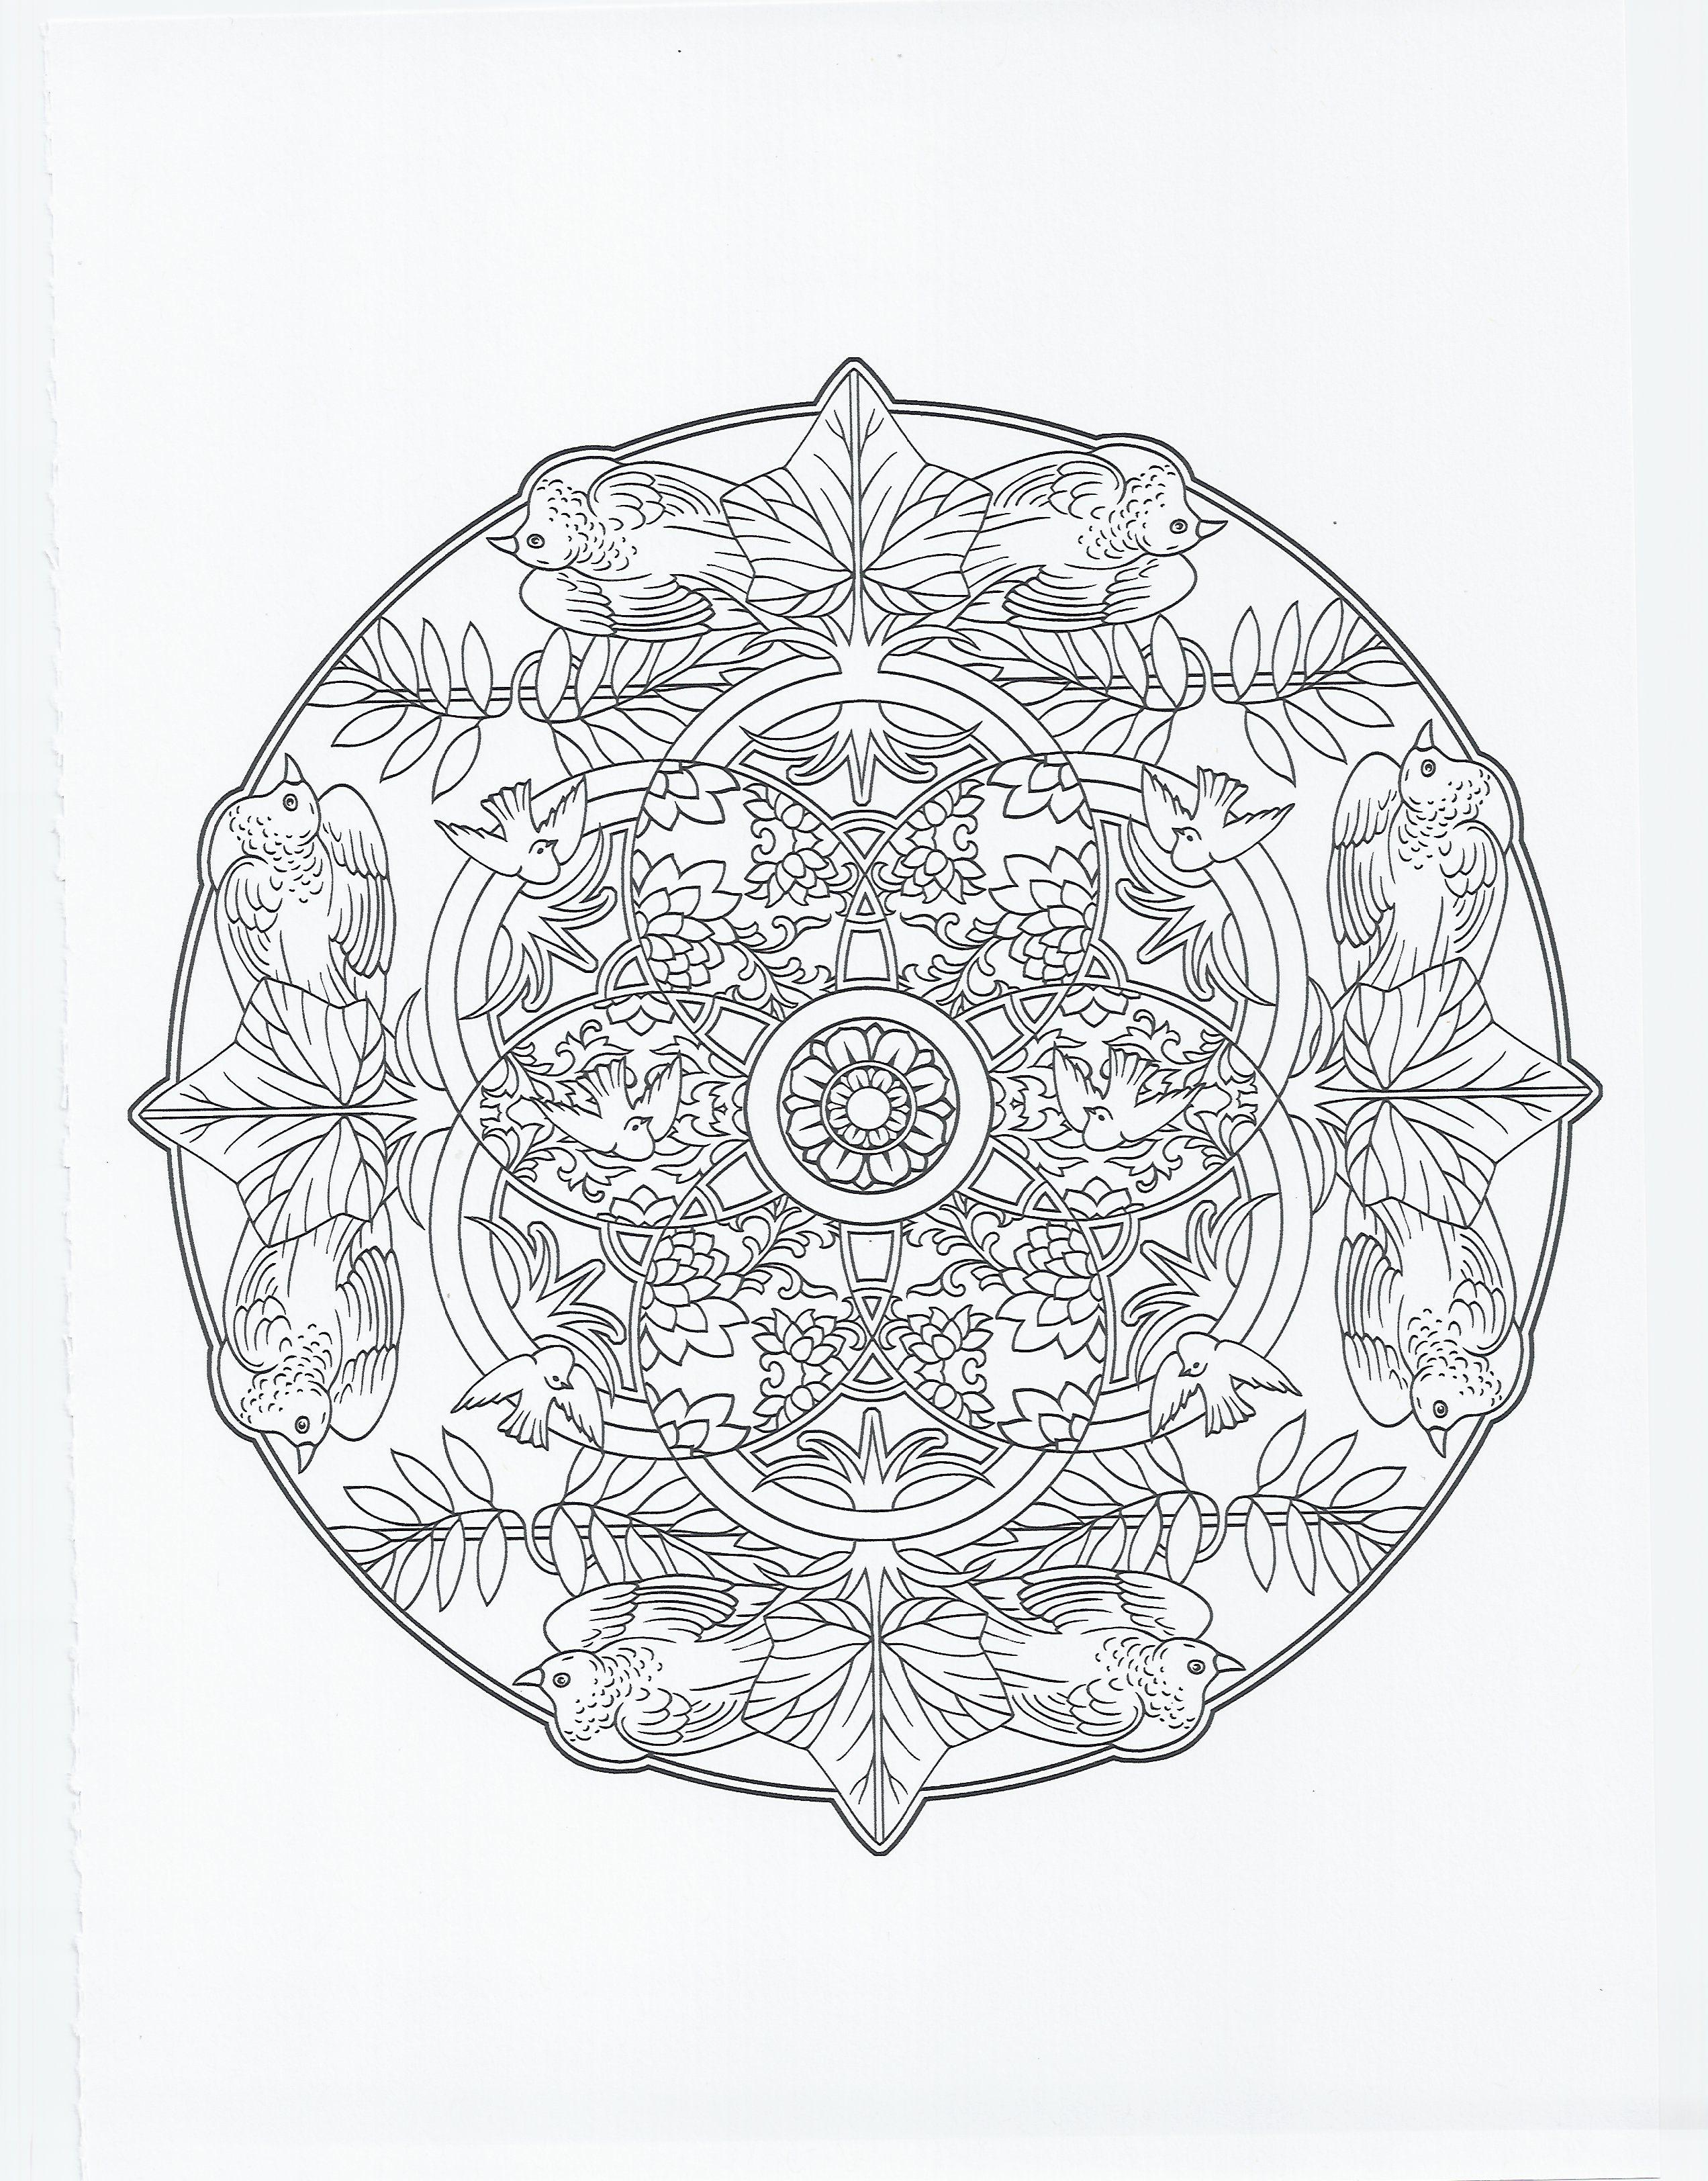 animal mandala bird coloring pages pinterest mandala mandalas and art techniques. Black Bedroom Furniture Sets. Home Design Ideas